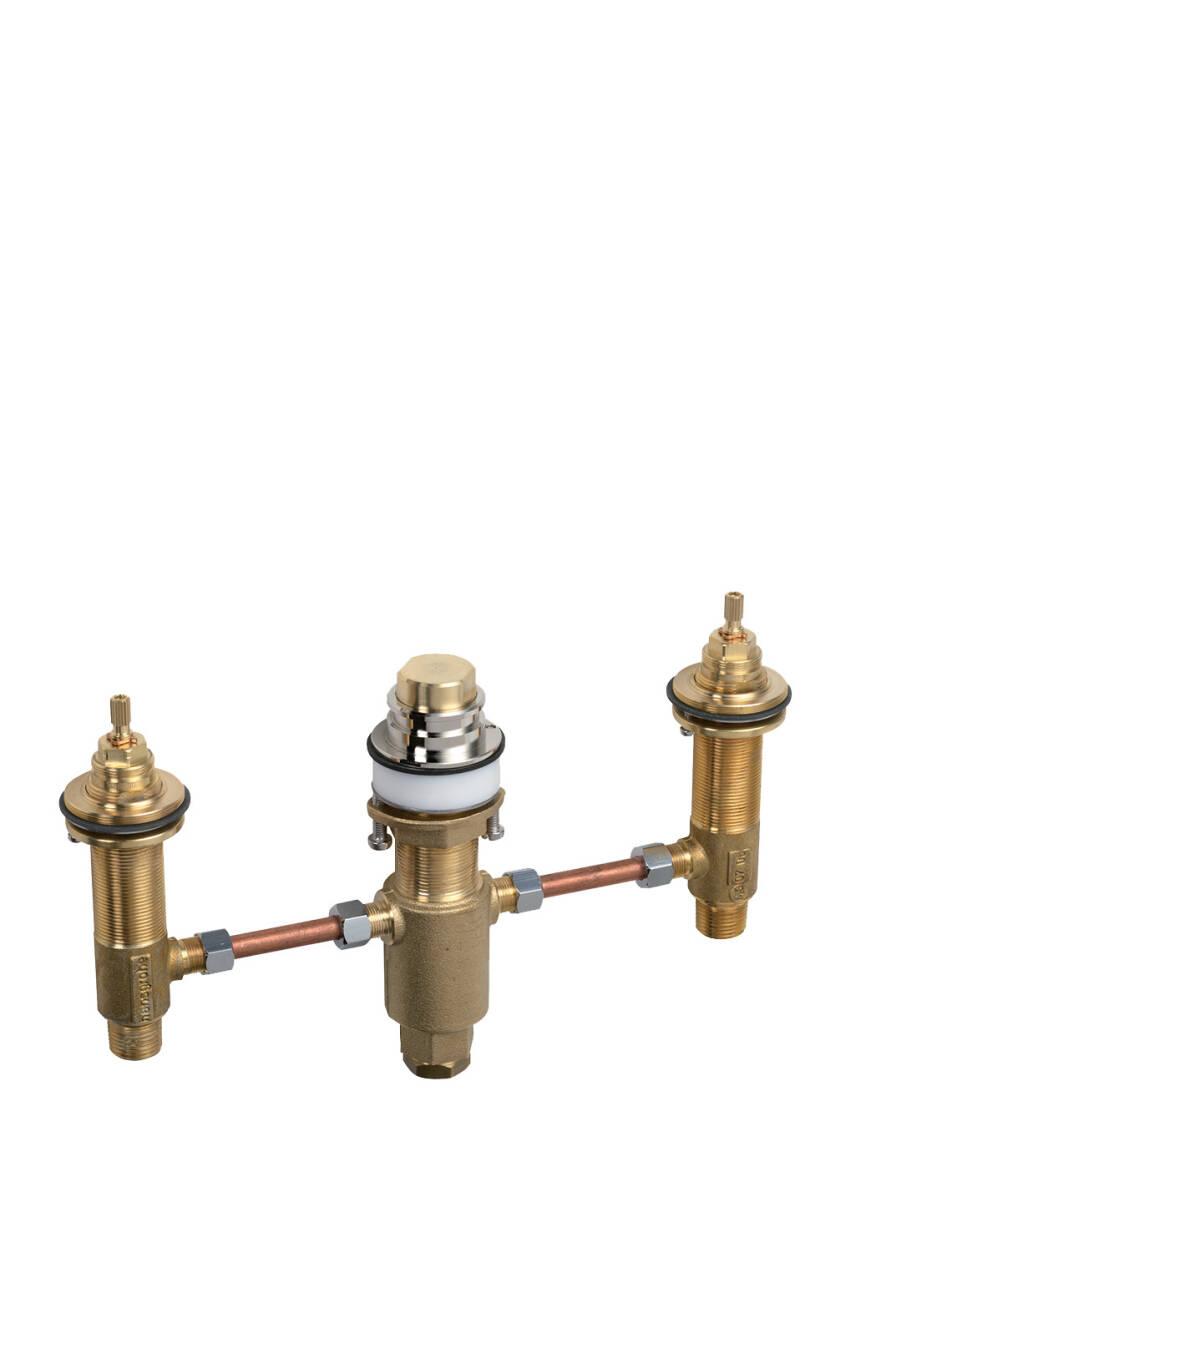 Basic set for 3-hole rim mounted bath mixer, n.a., 15484180